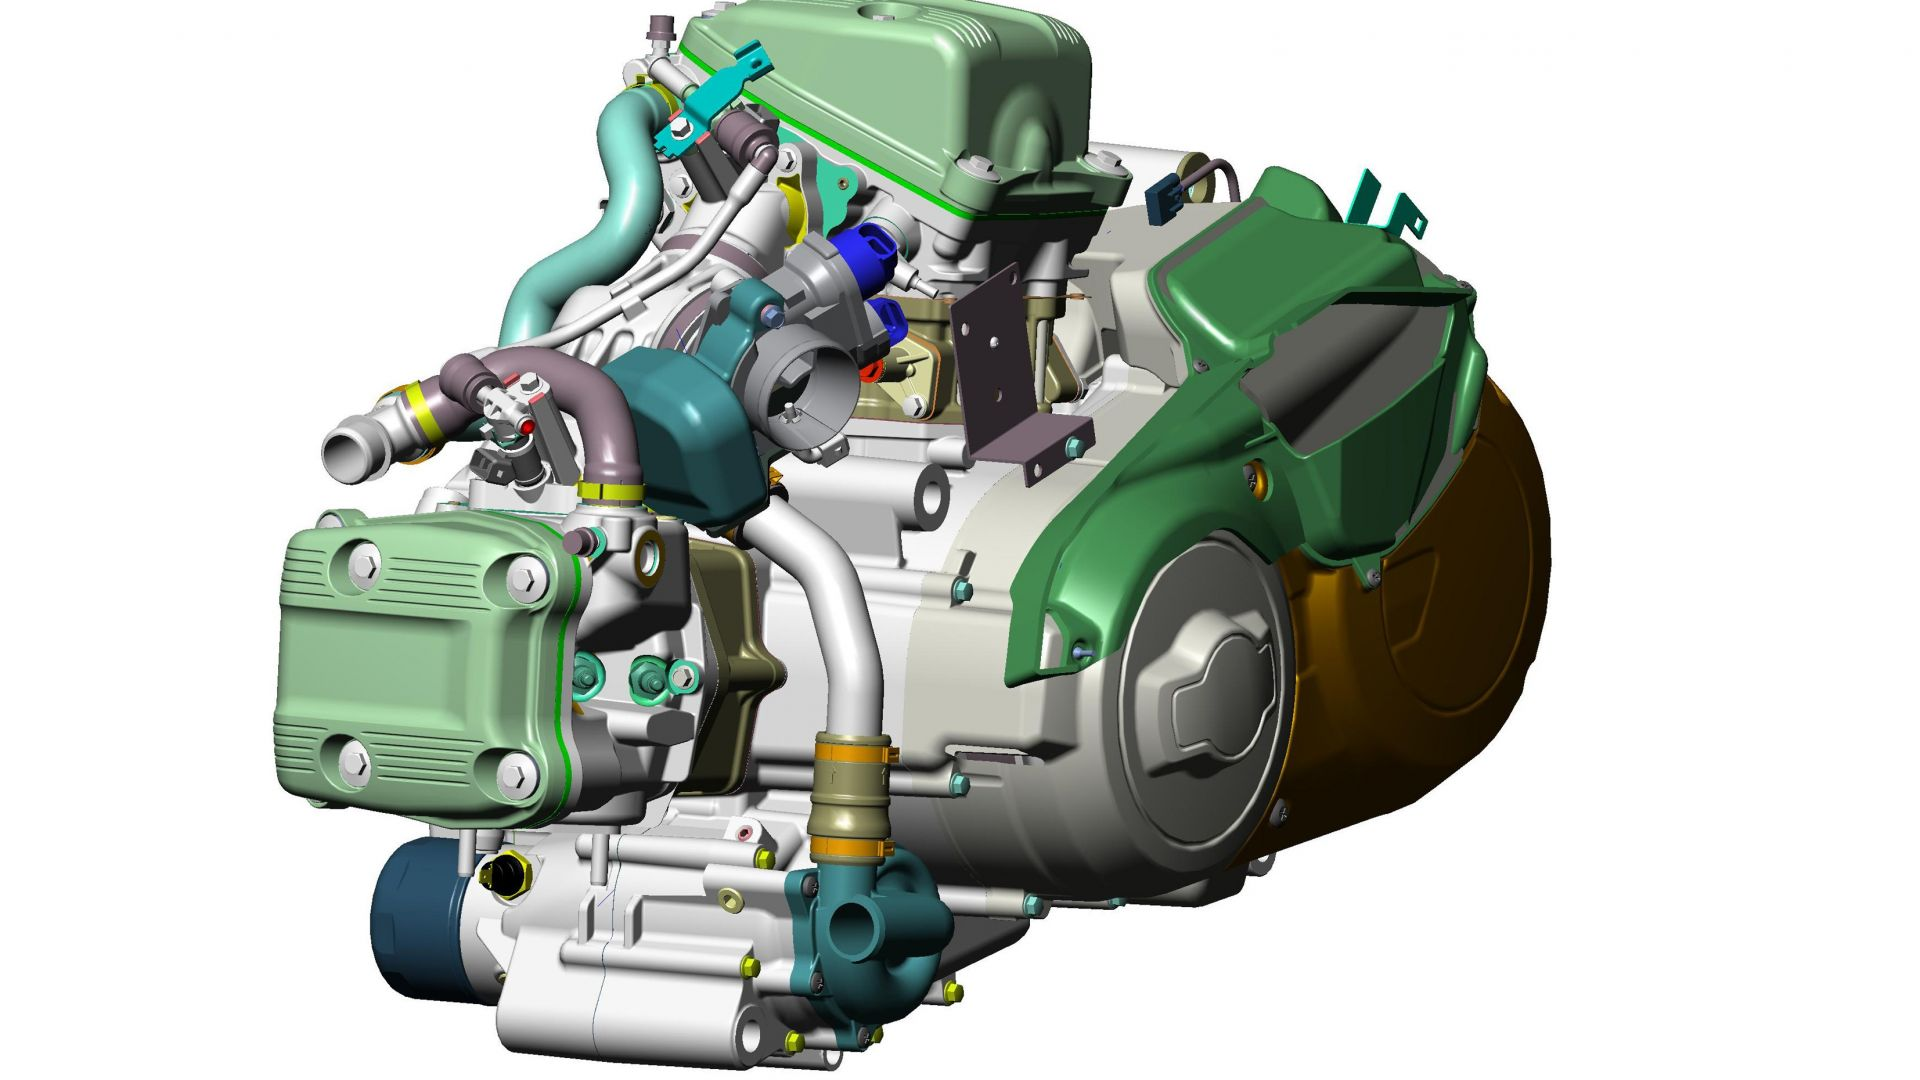 Immagine 46: Aprilia SRV 850 ABS/ATC